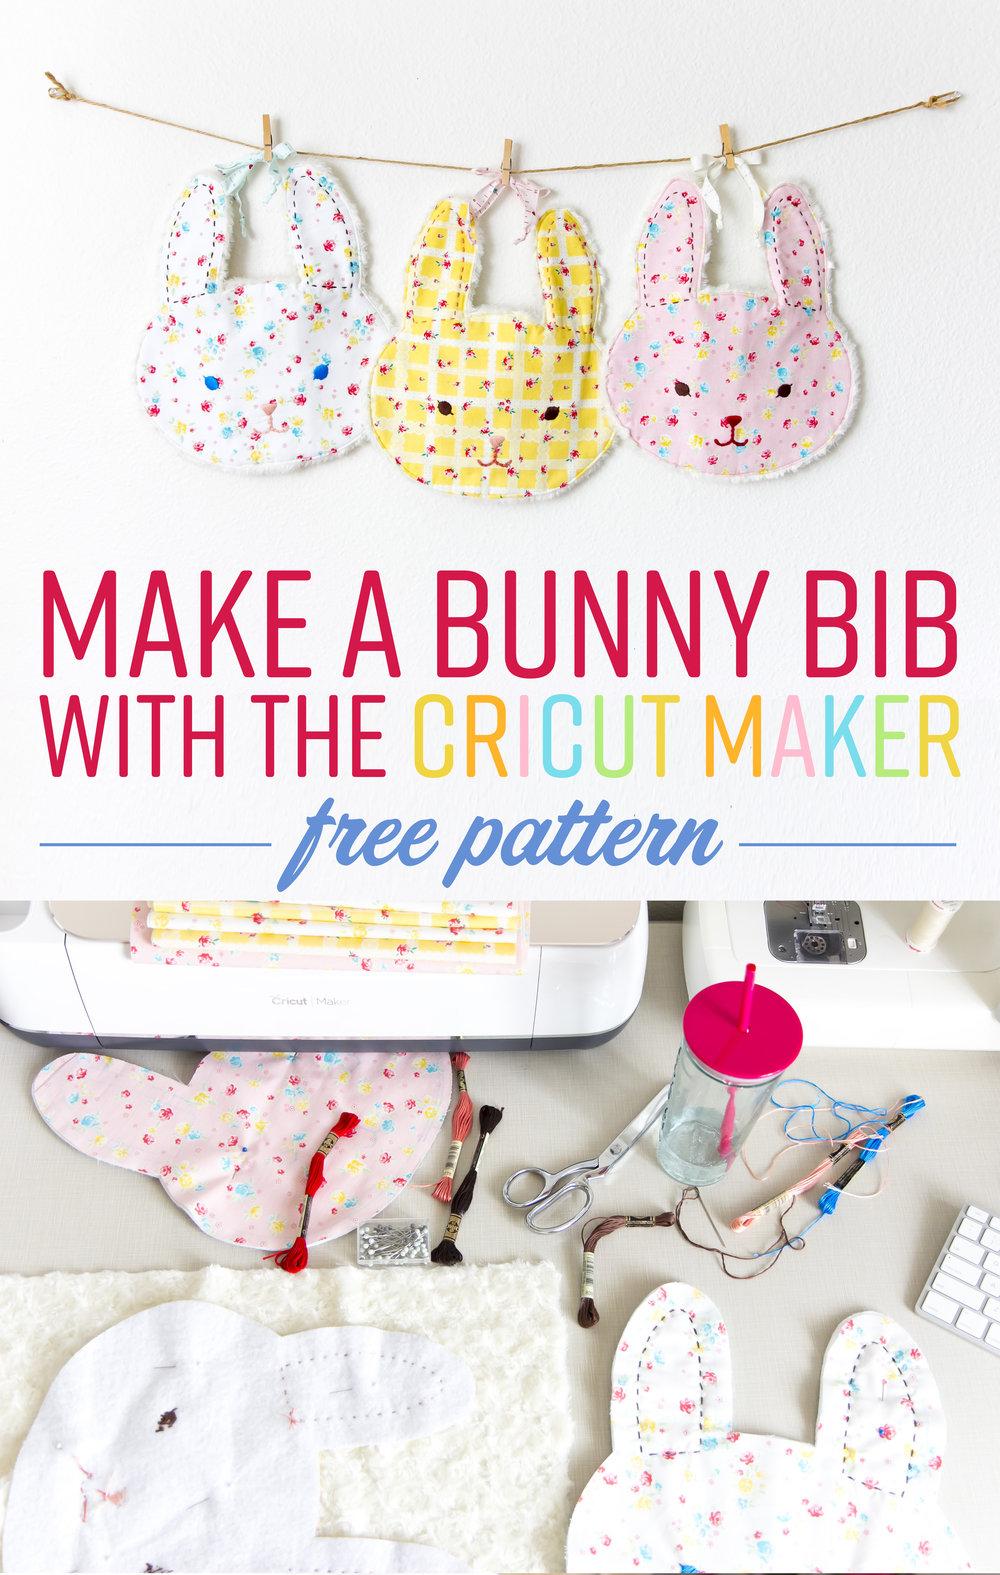 pinterest-cricut-maker-bunny-bib-free-pattern.jpg